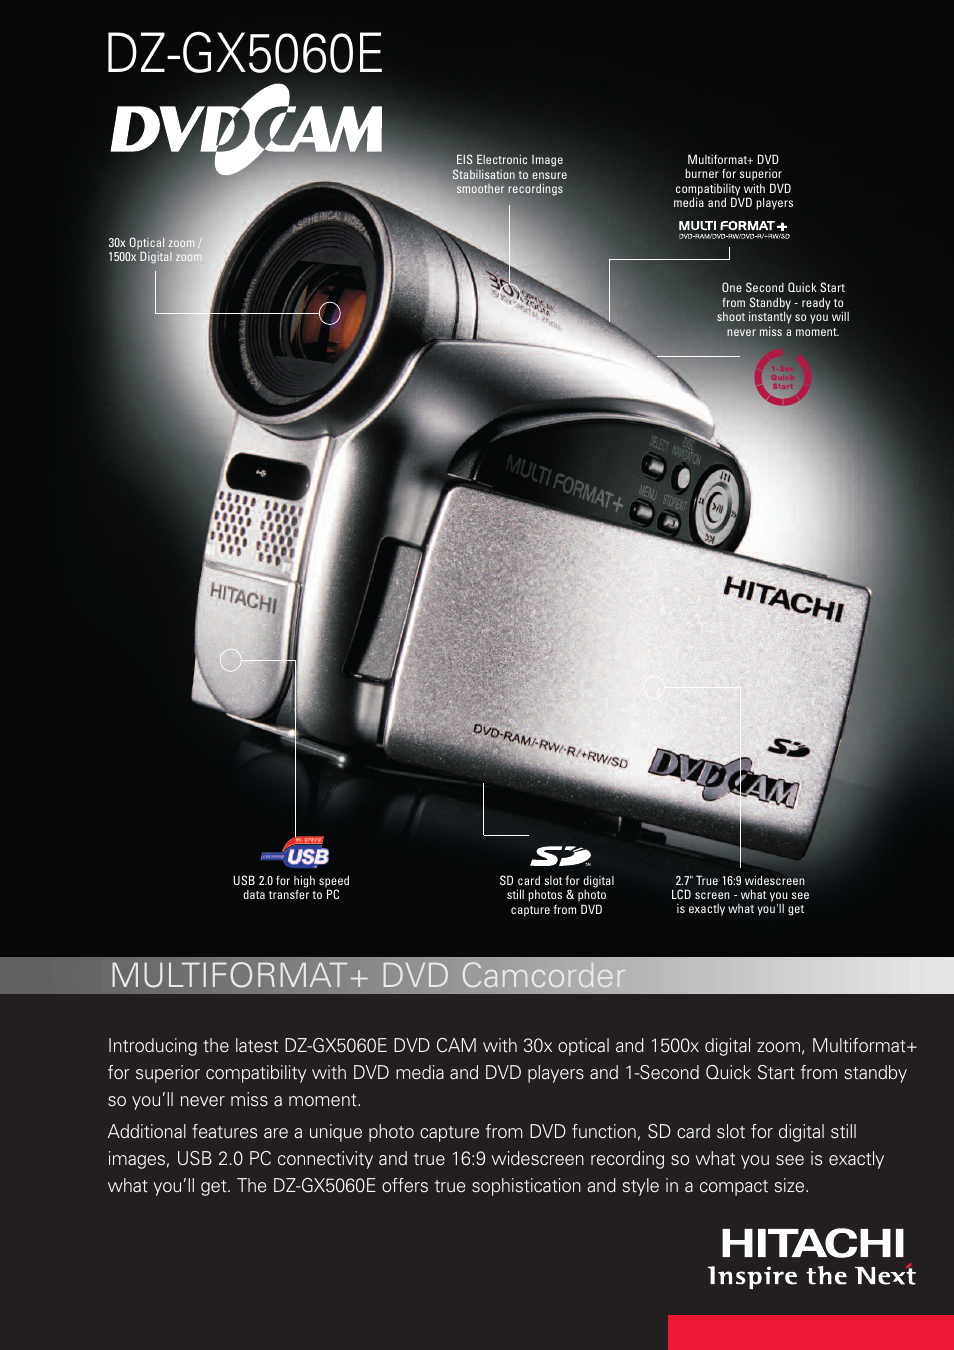 hitachi dz gx5060e user manual 2 pages rh manualsdir com hitachi mini dvd camcorder manual hitachi hybrid camcorder manual